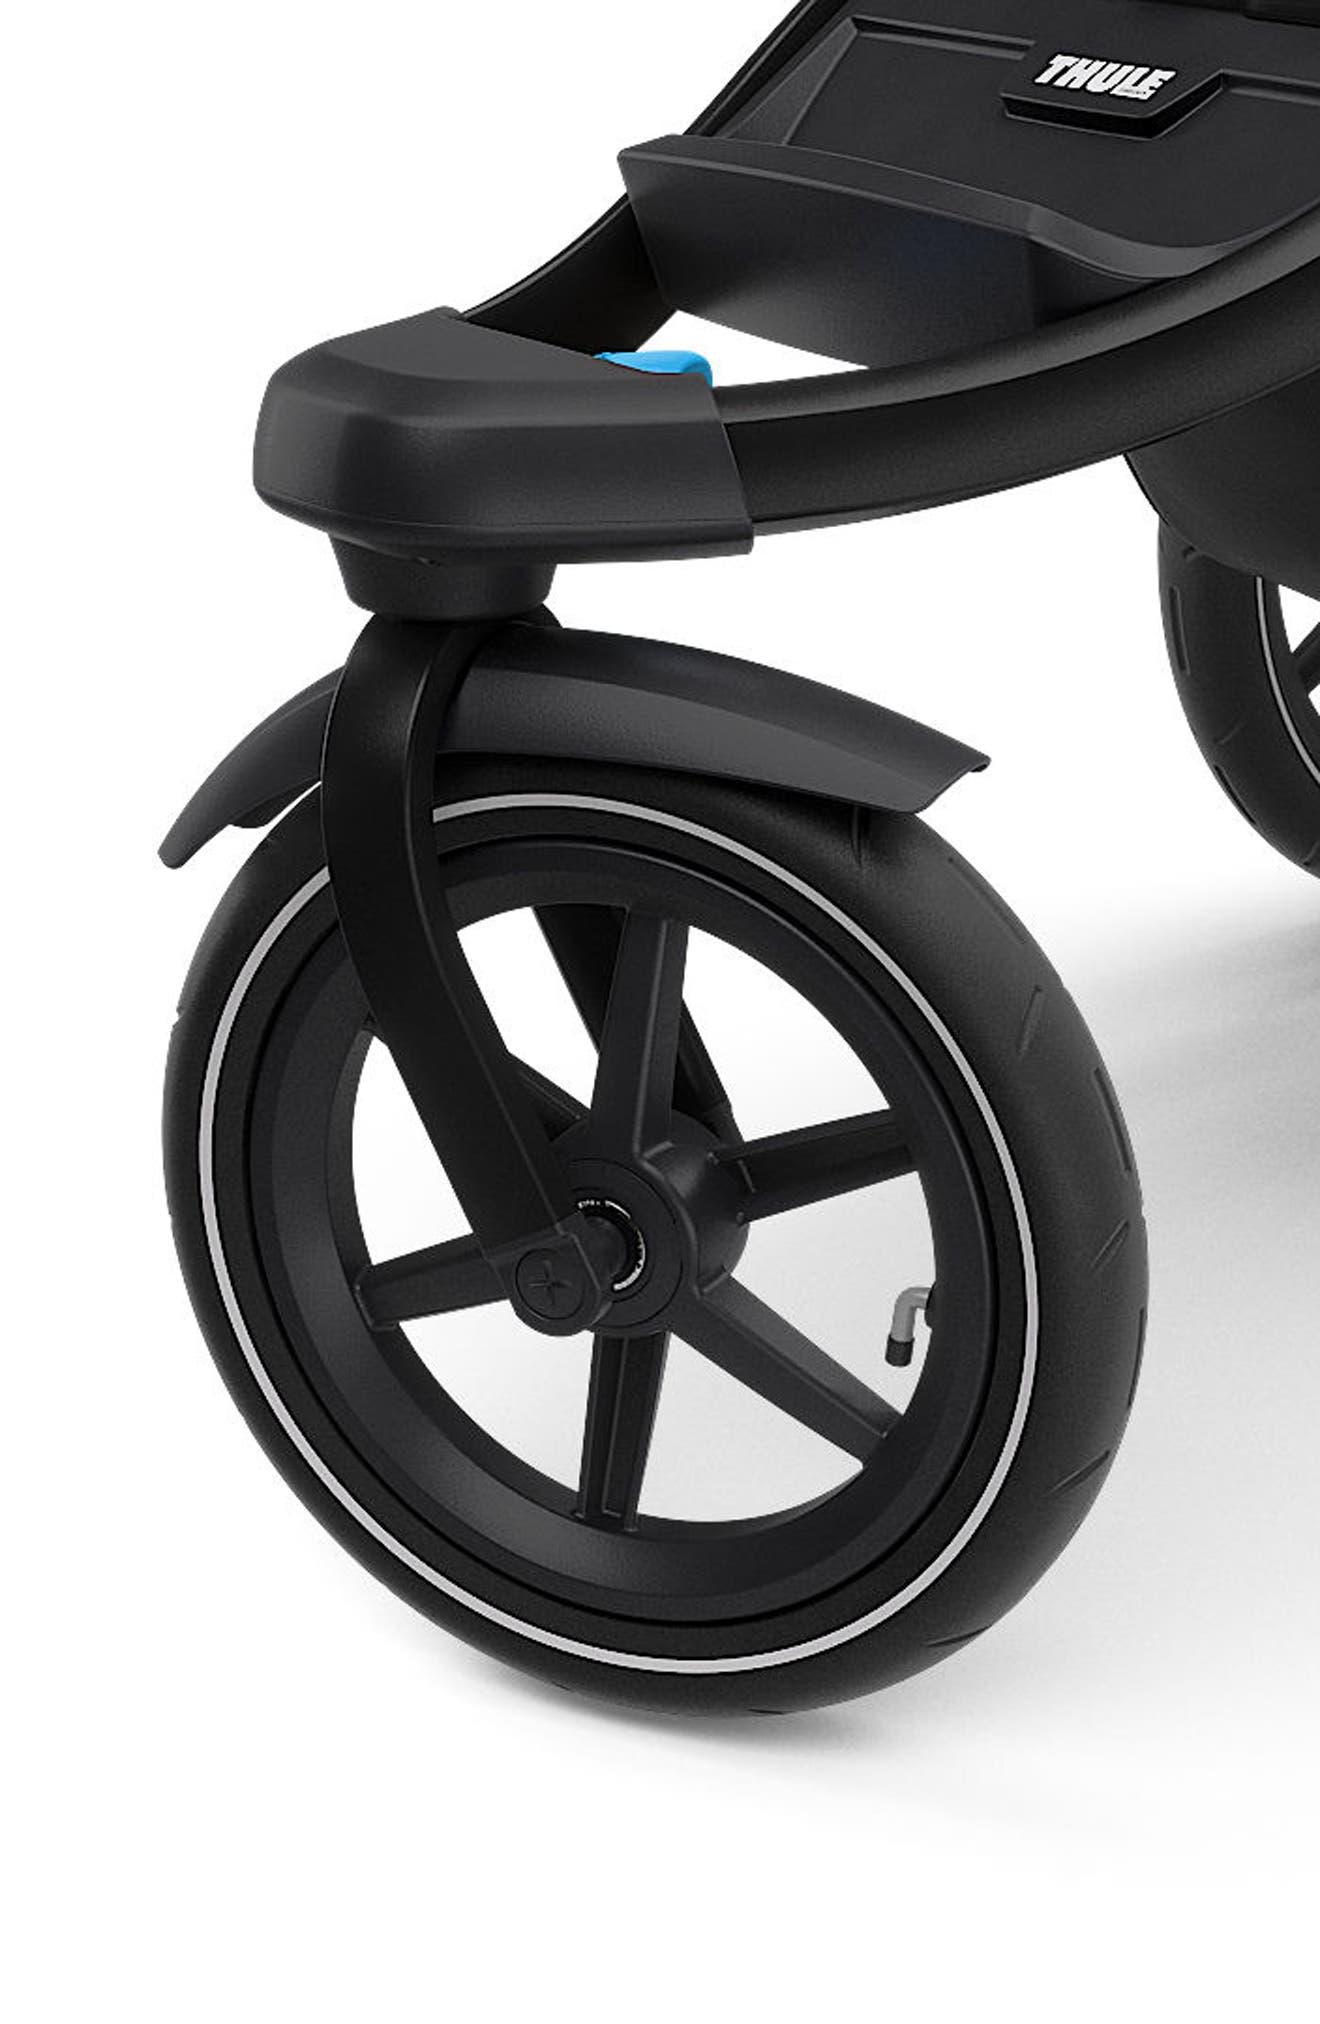 THULE,                             Urban Glide 2 Jogging Stroller with Black Frame,                             Alternate thumbnail 5, color,                             006